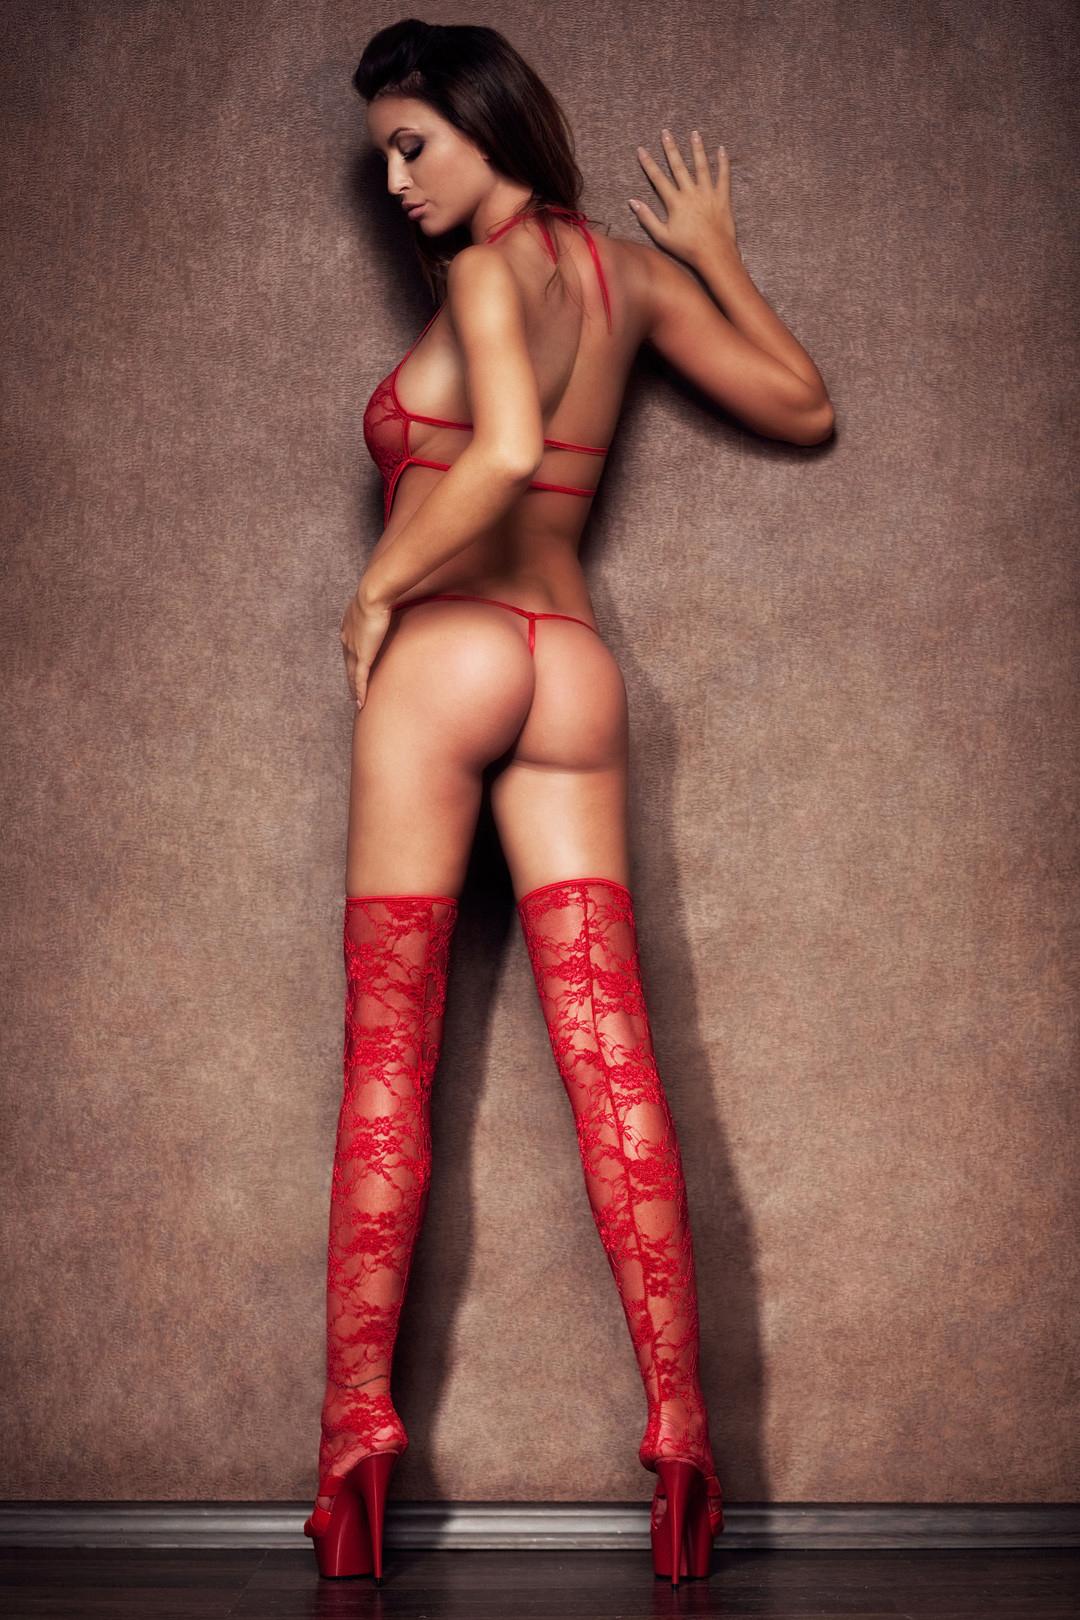 hot women's back who wearing see through red lingerie - Monika Pietrasinska